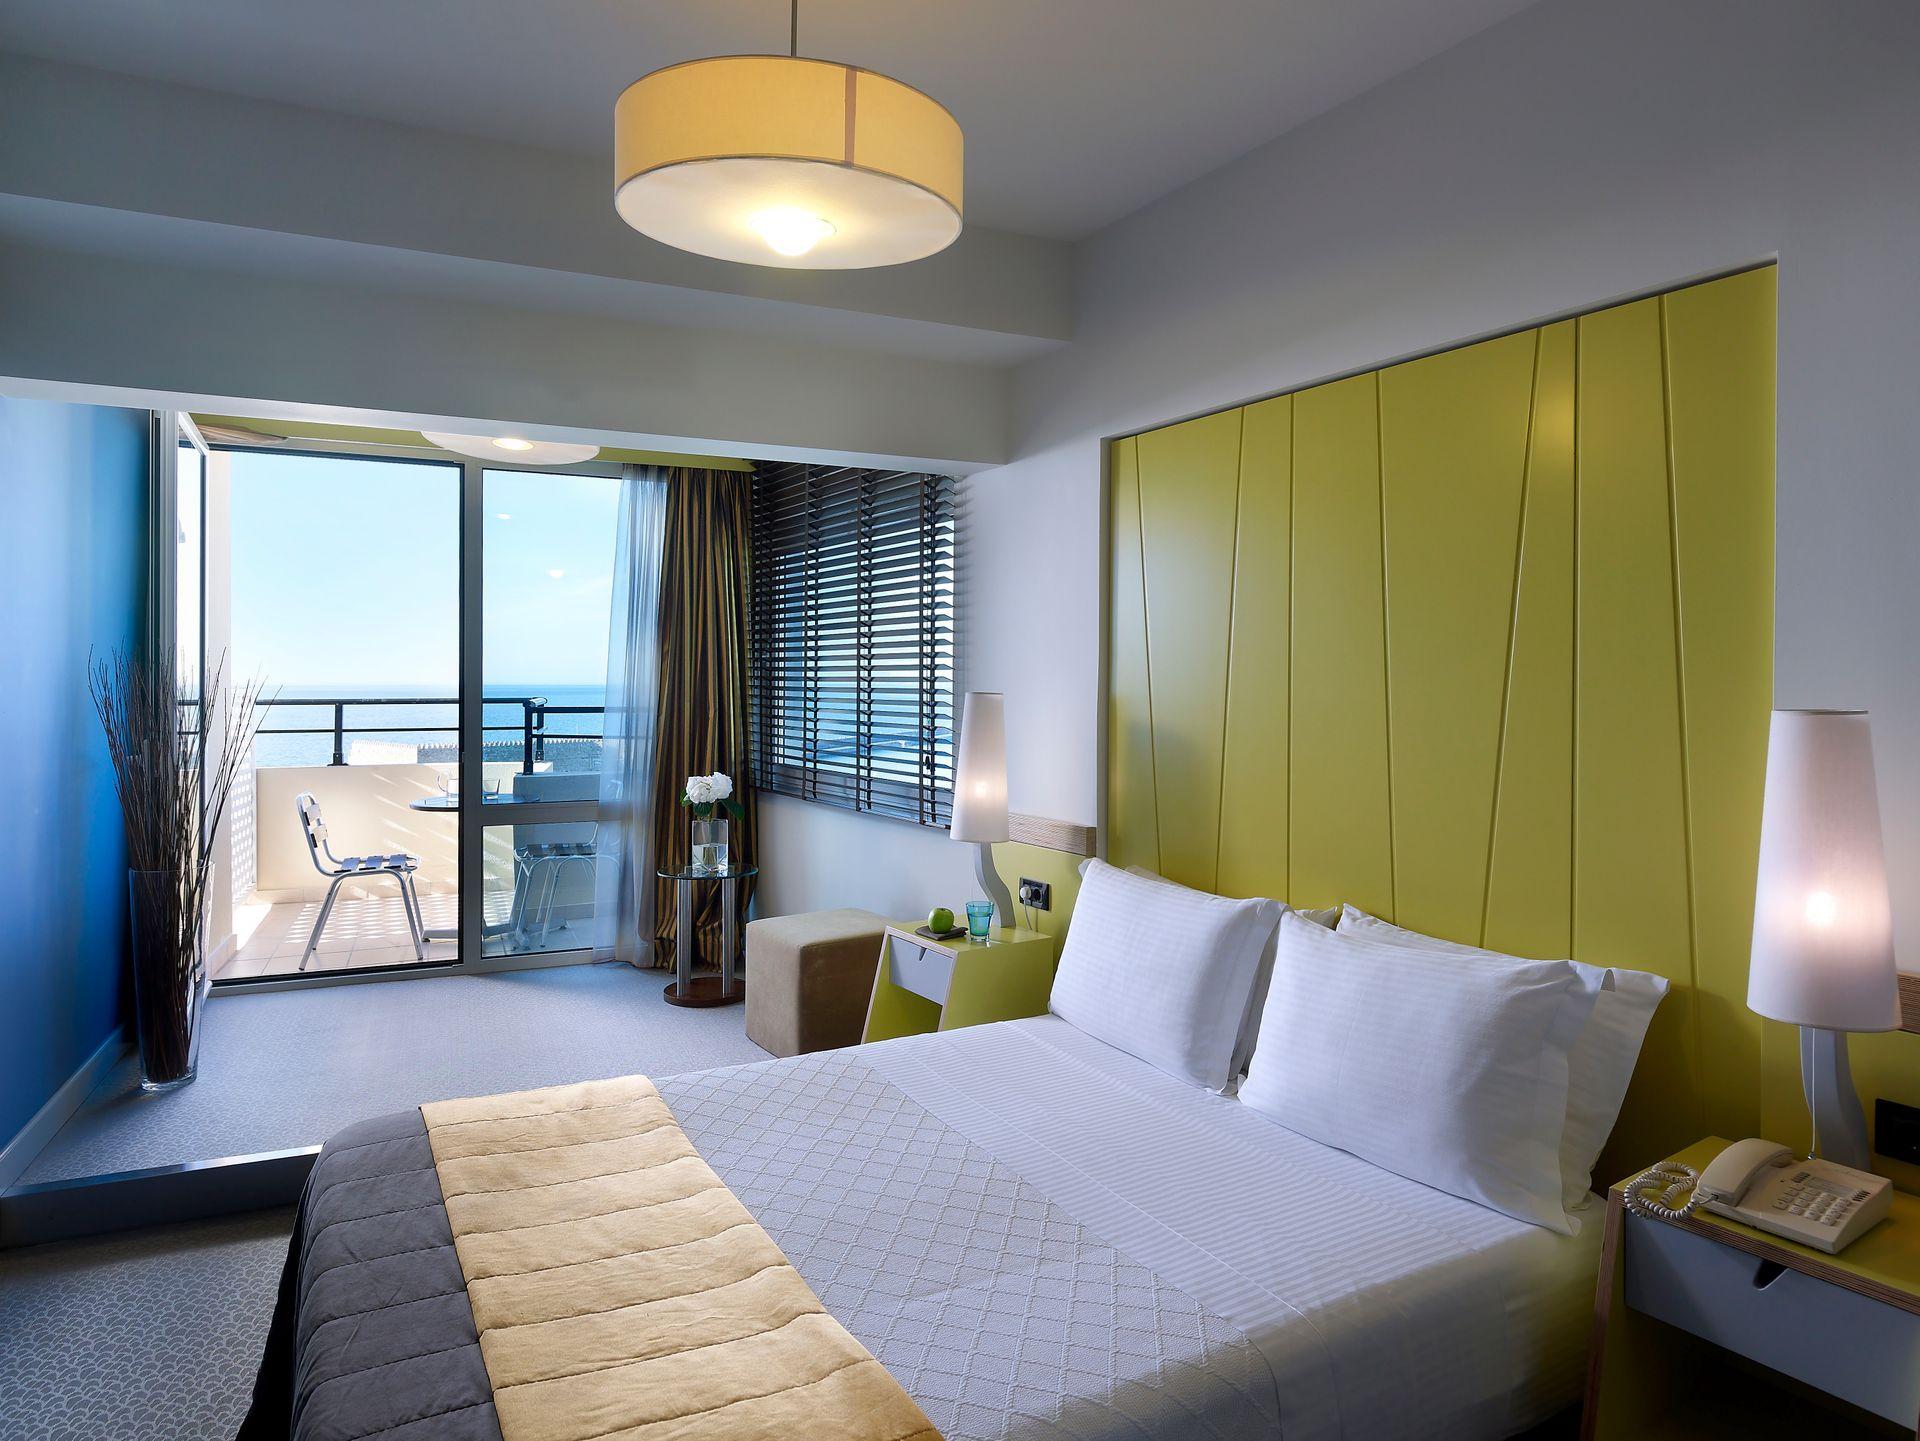 4* Lato Boutique Hotel - Ηράκλειο, Κρήτη ✦ 2 Ημέρες (1 Διανυκτέρευση) ✦ 2 άτομα ✦ Πρωινό ✦ 01/06/2021 έως 30/09/2021 ✦ Υπέροχη Τοποθεσία!